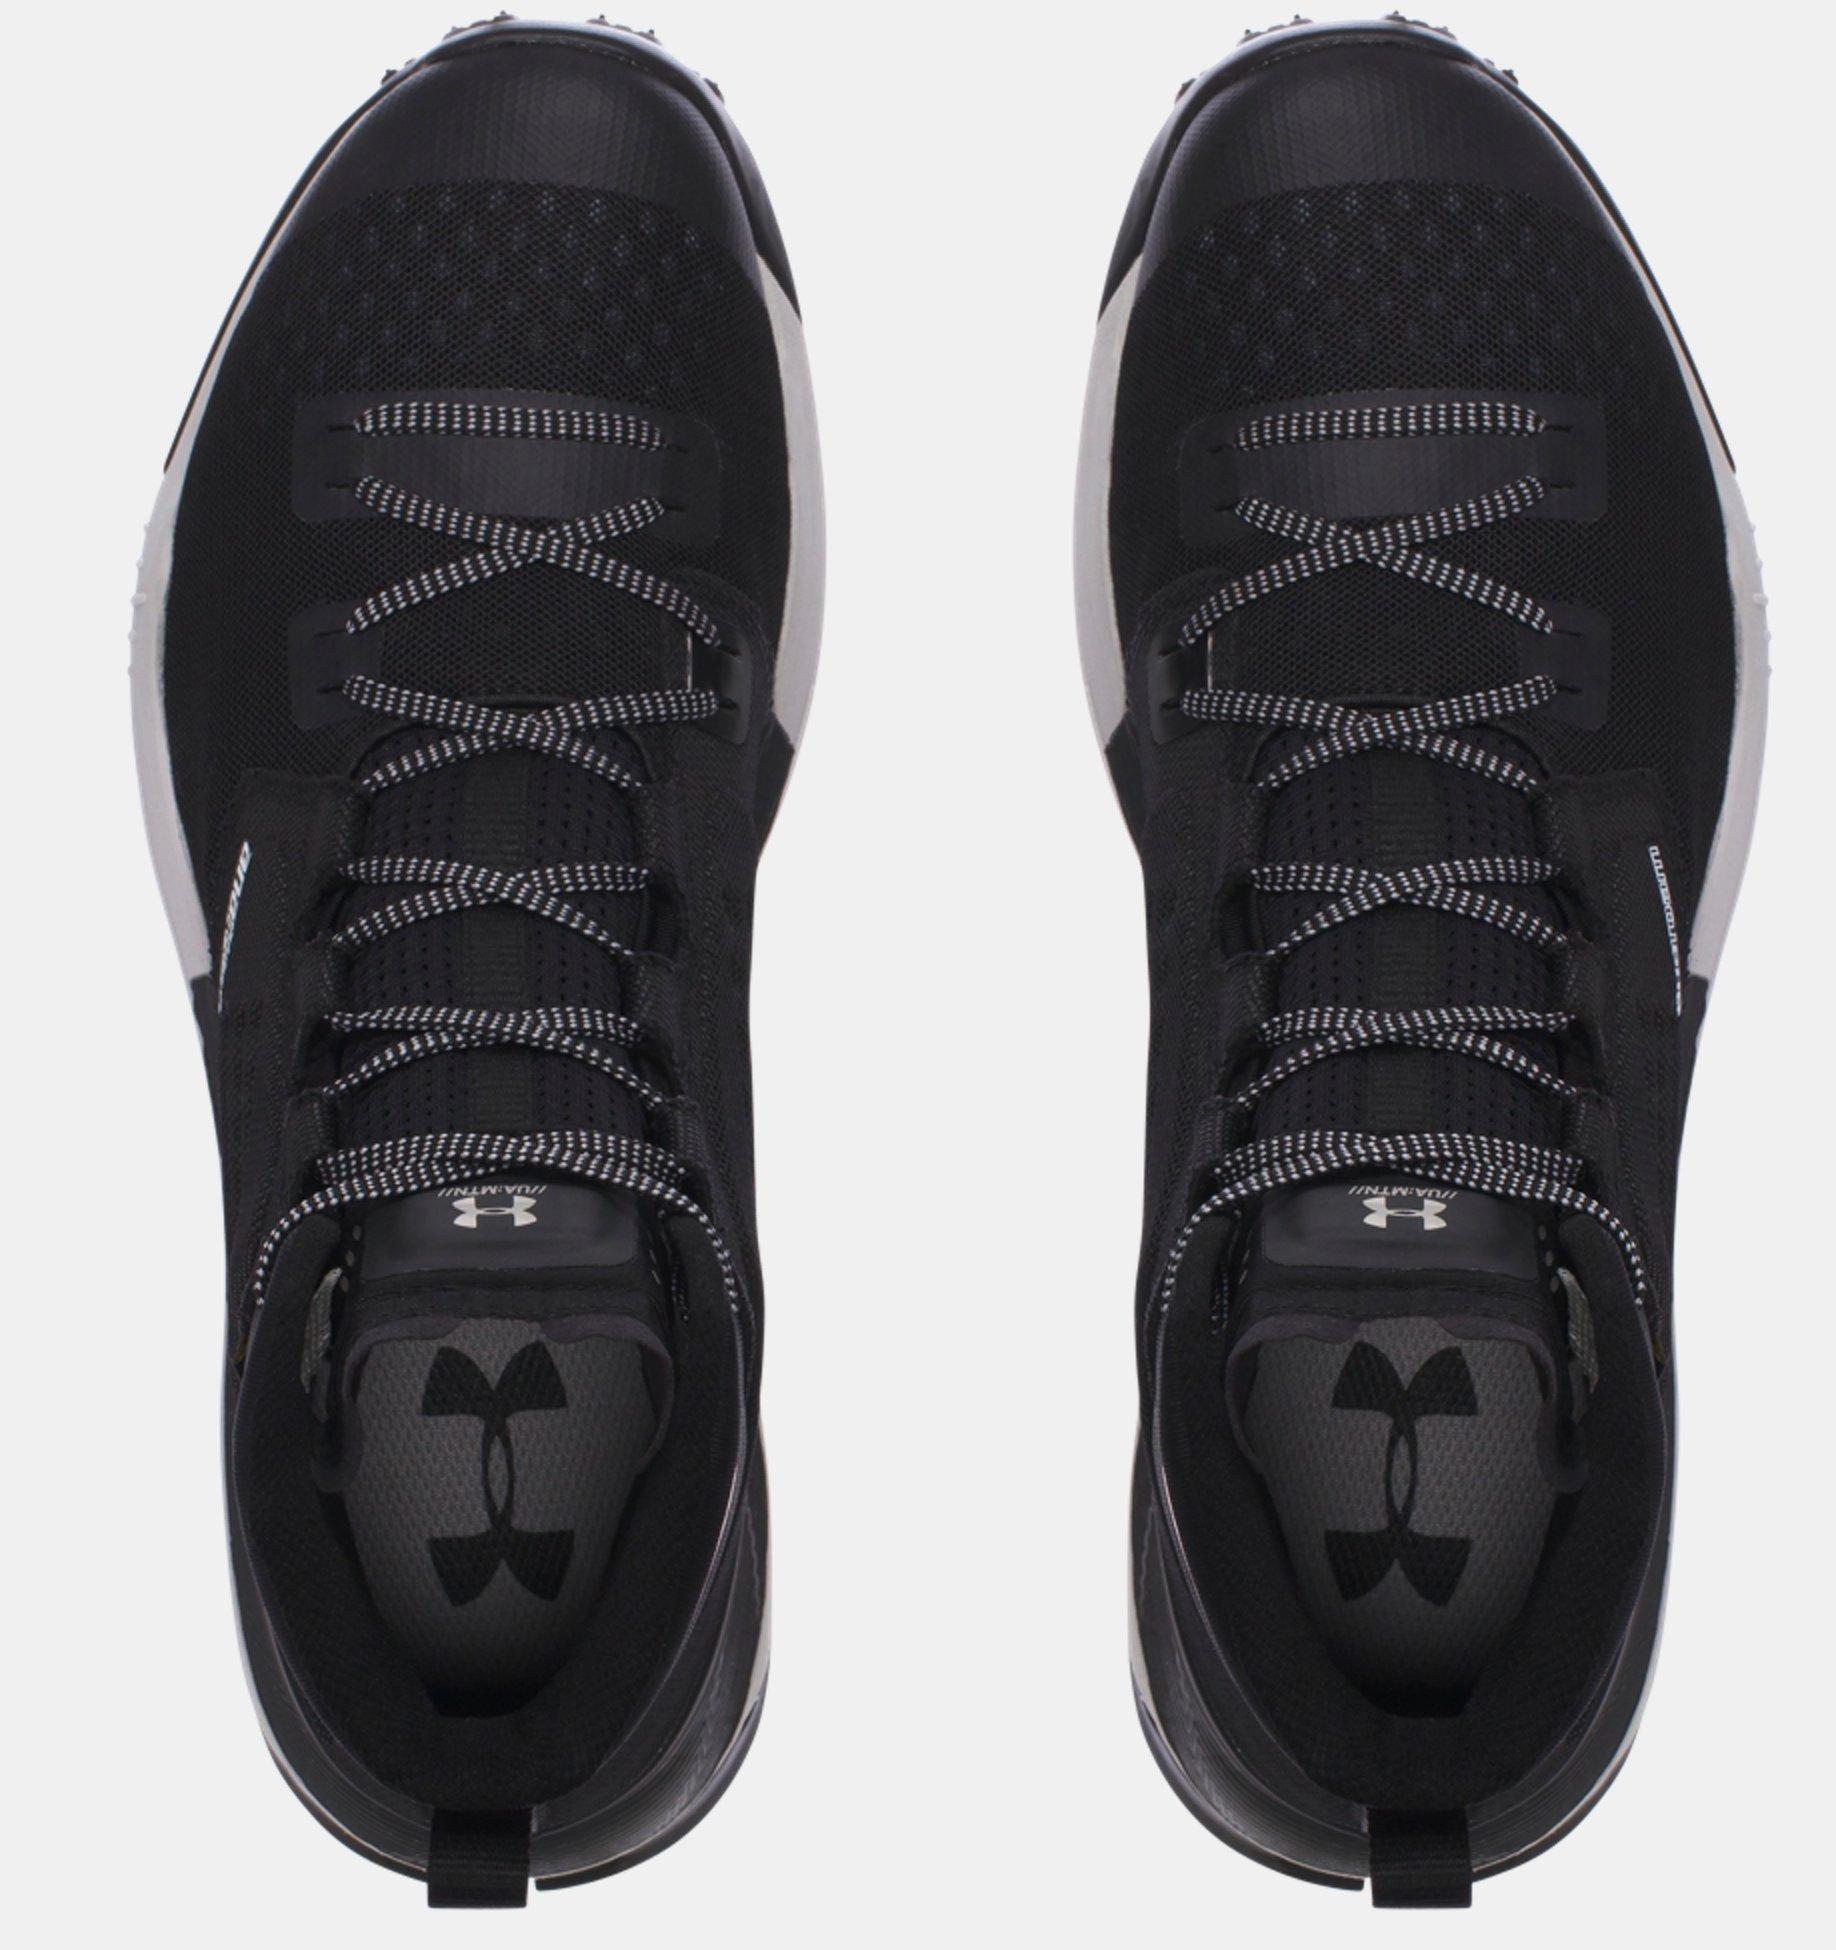 2850f691c6c Under Armour - Sportswear, Sport Shoes, & Accessories | UK